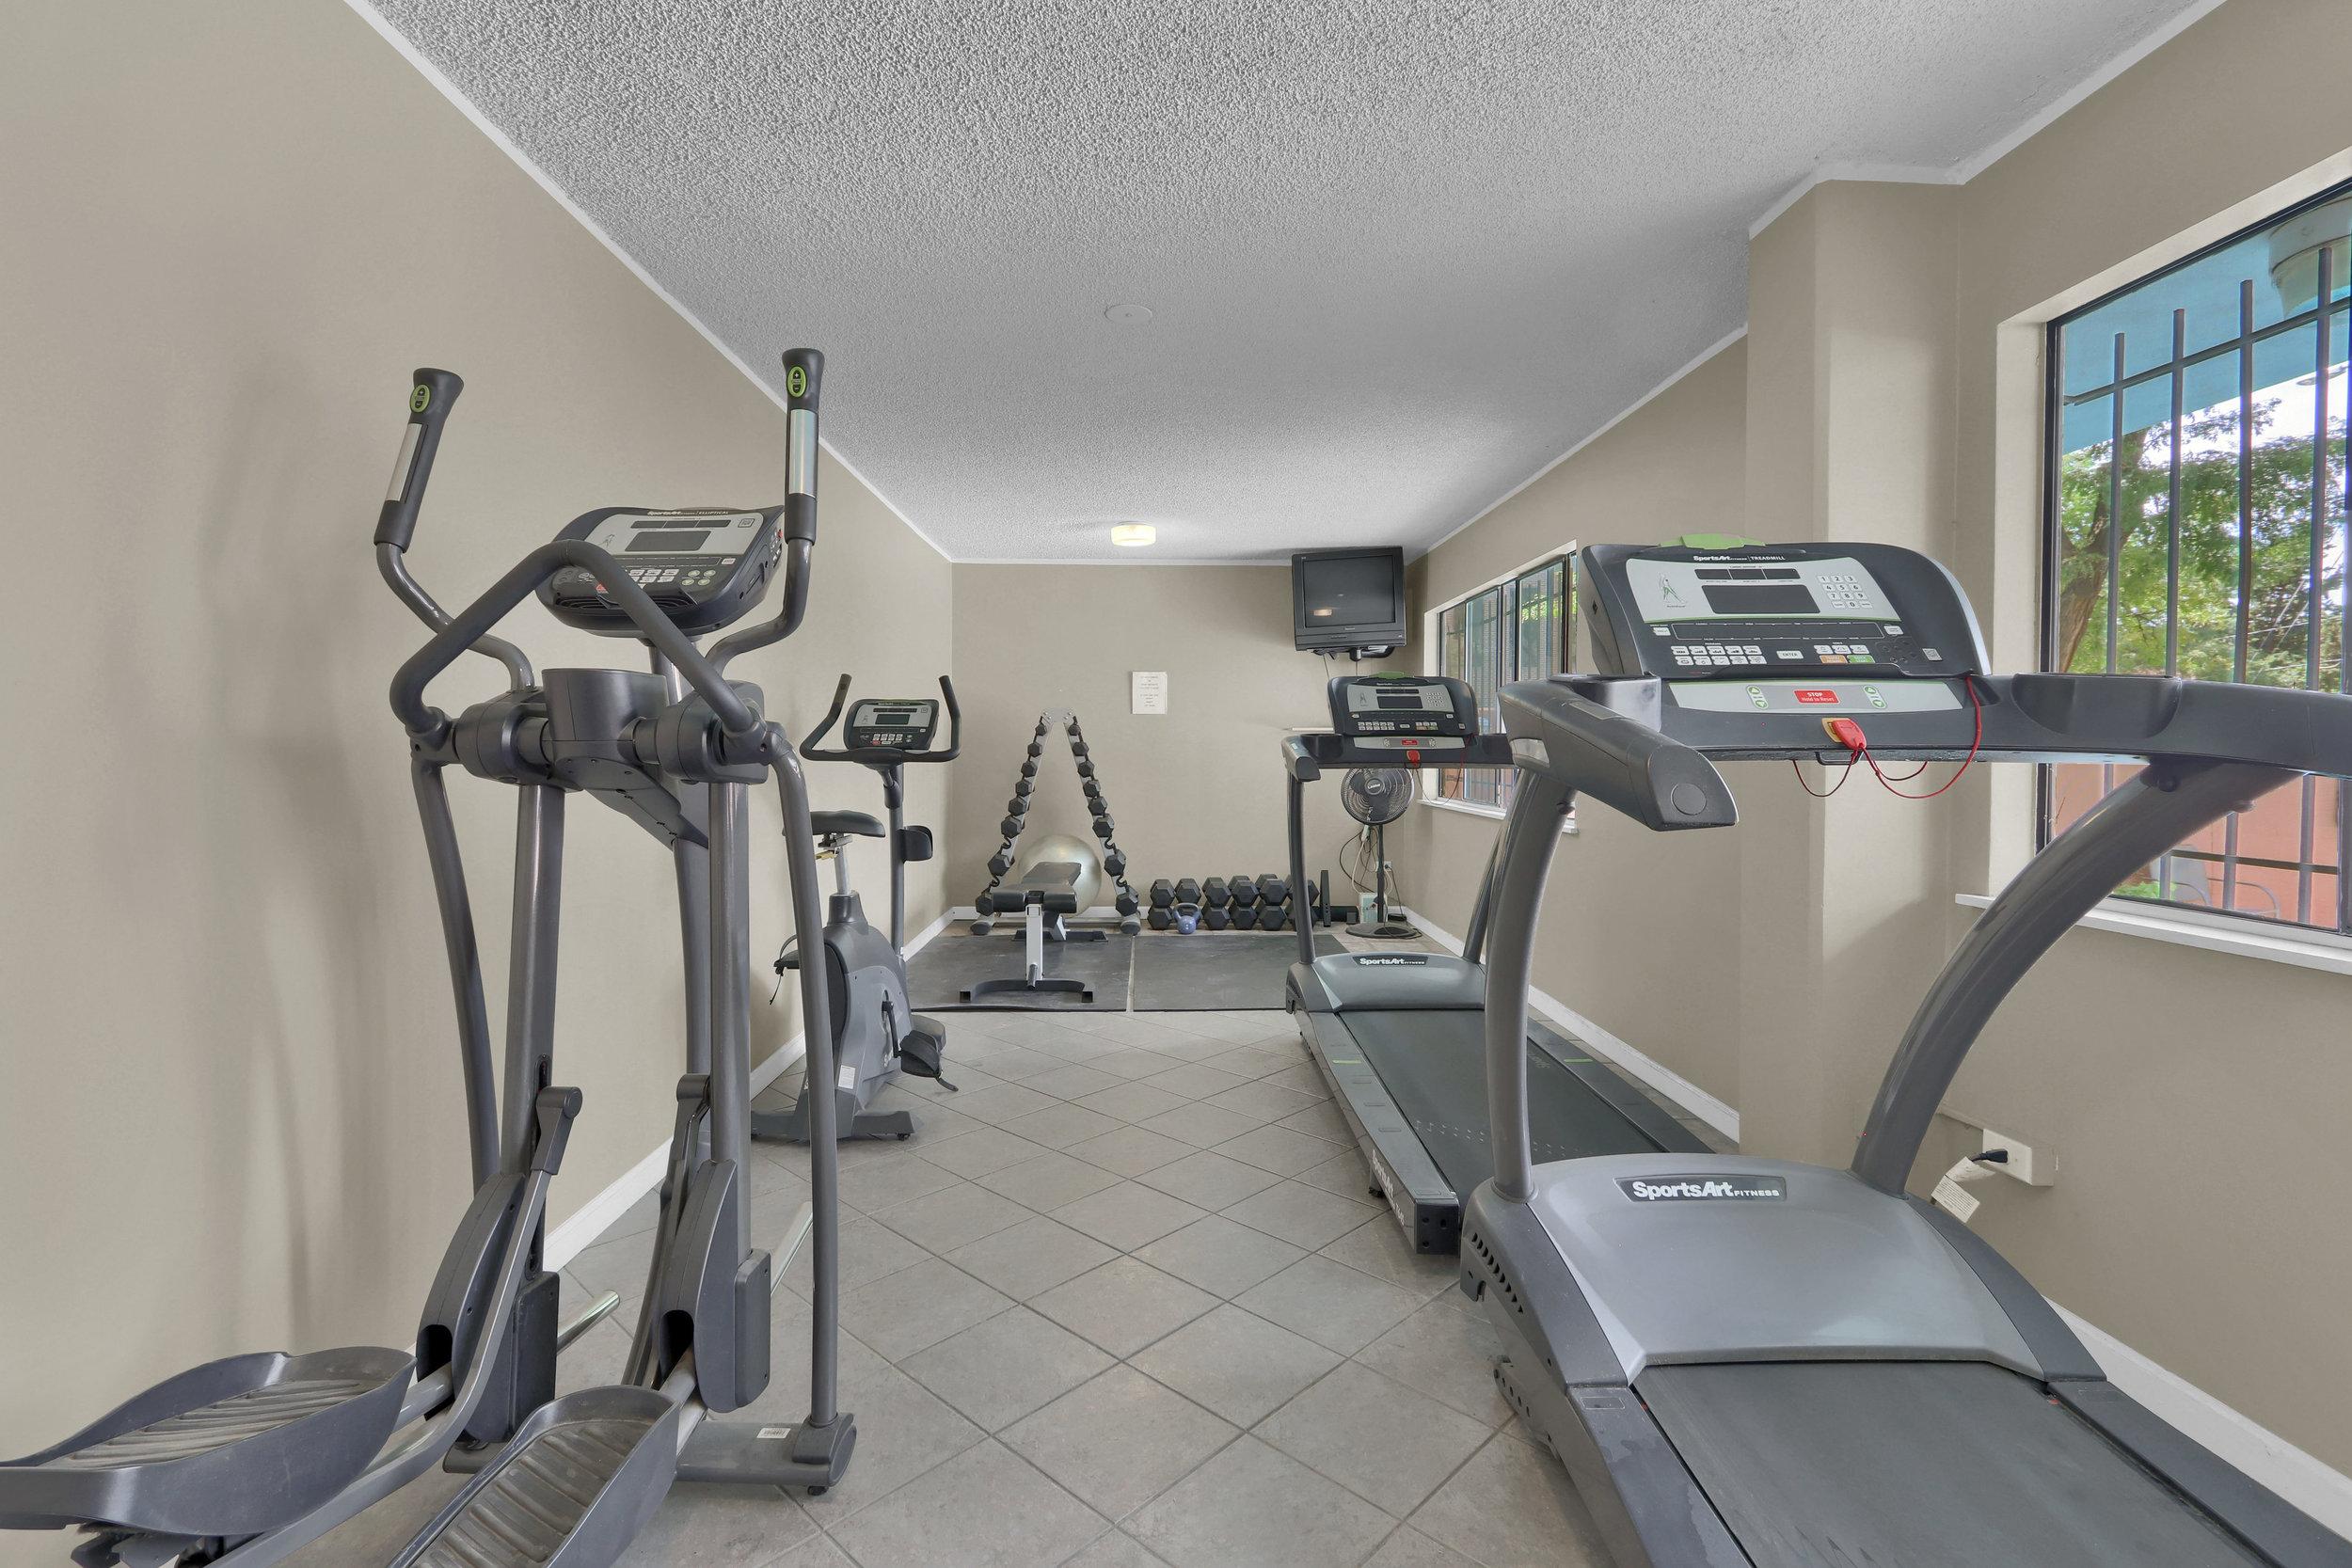 909 N Logan St Unit 3J Denver-print-024-022-Exercise Room-4200x2800-300dpi.jpg